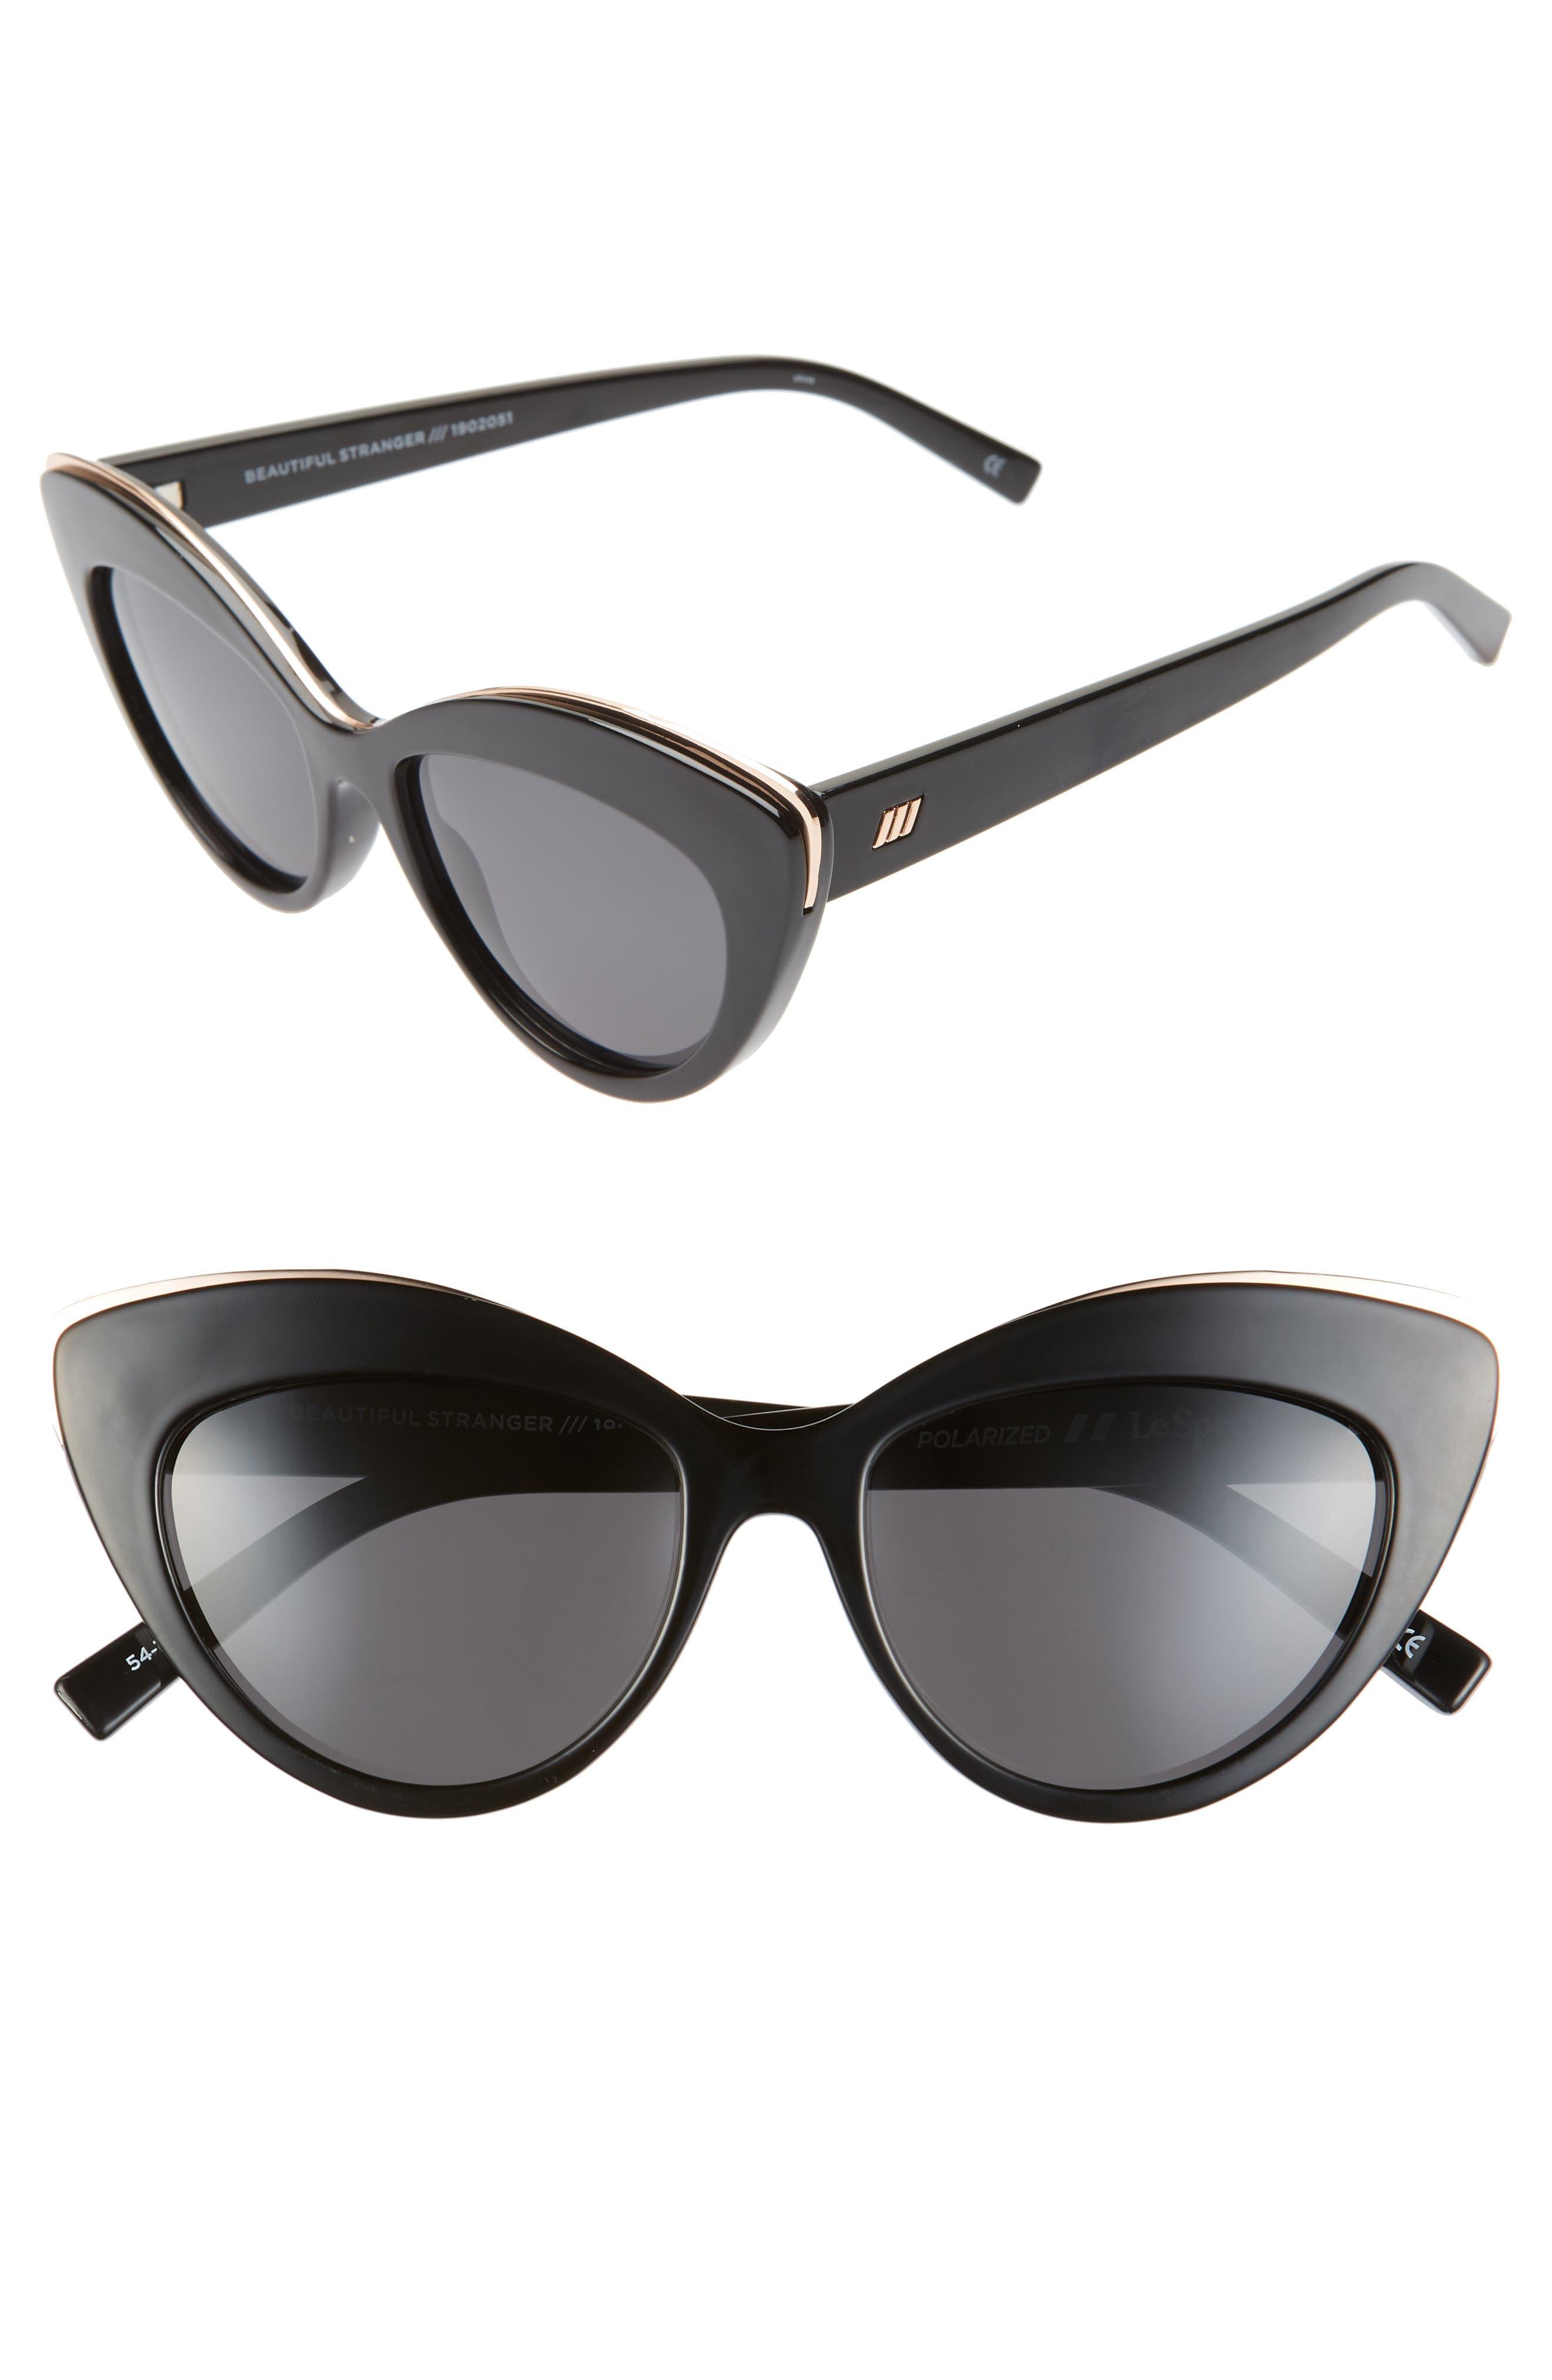 Le Specs Beautiful Stranger 5m Polarized Cat Eye Sunglasses - Black